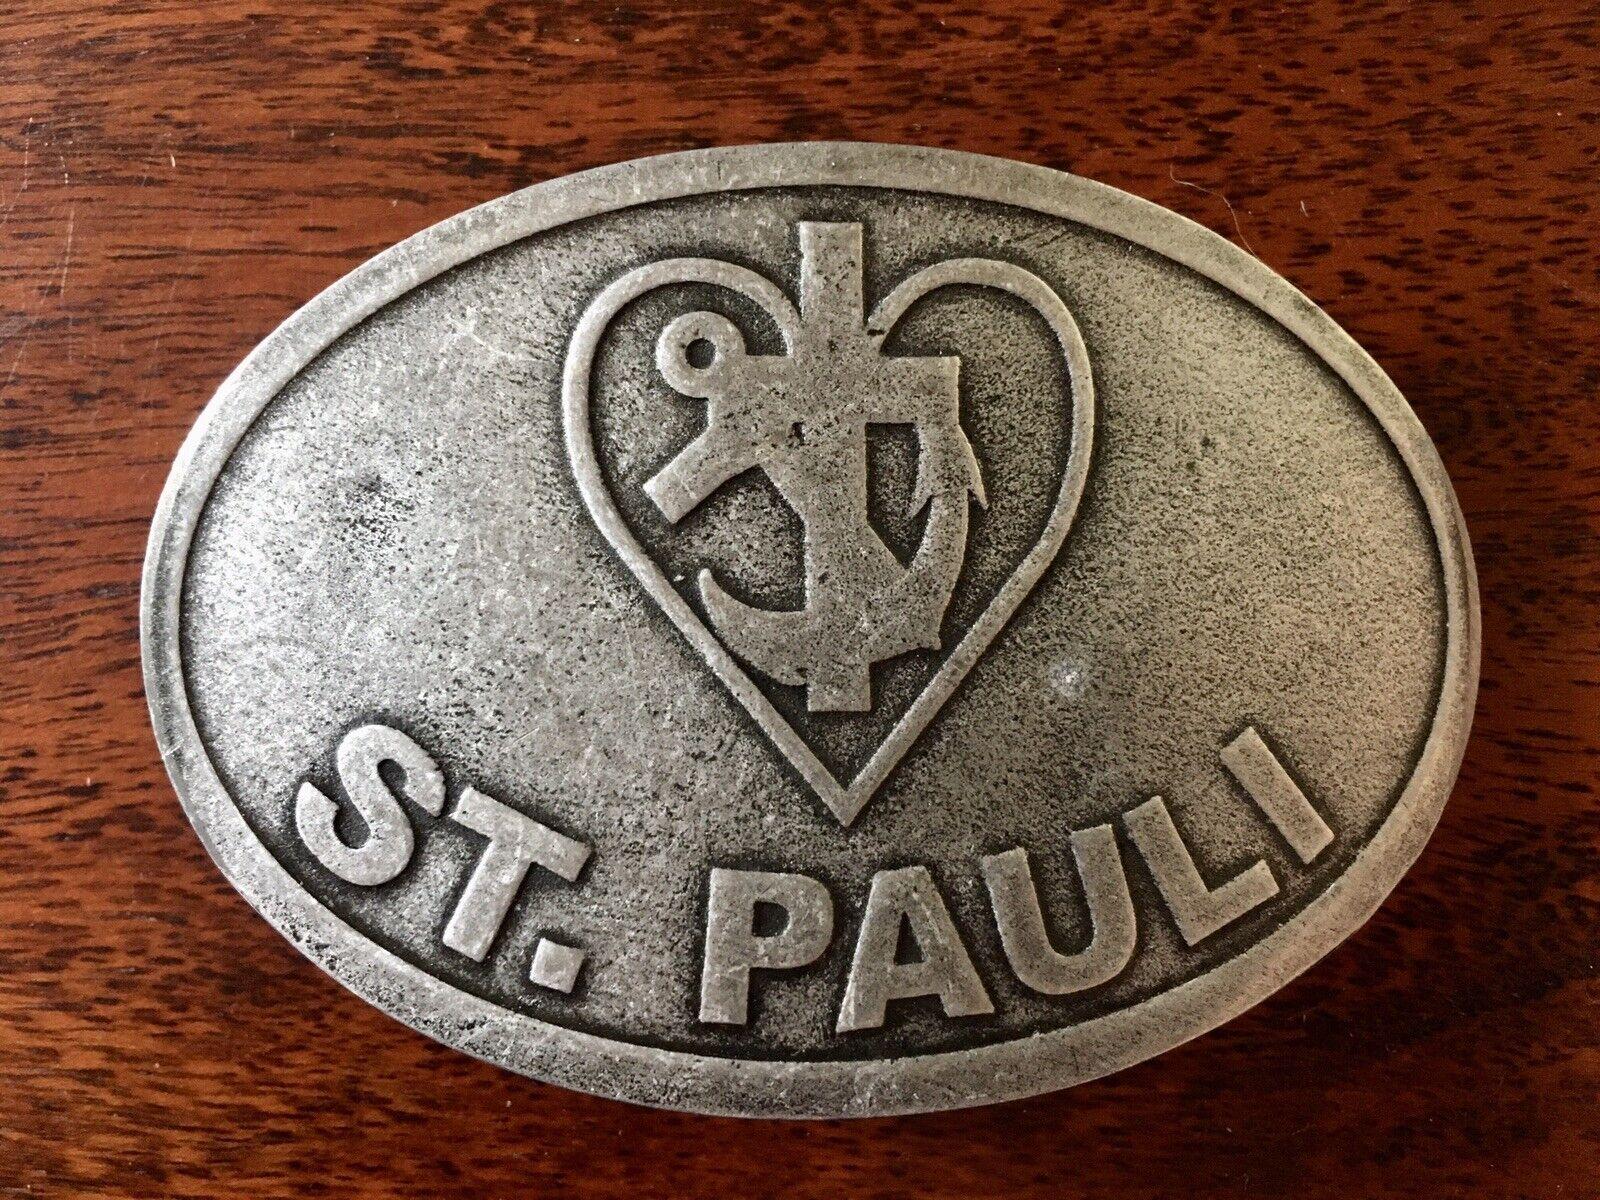 St. Pauli Gürtelschnalle Buckle Liebe Glaube Hoffnung Sankt neu FC